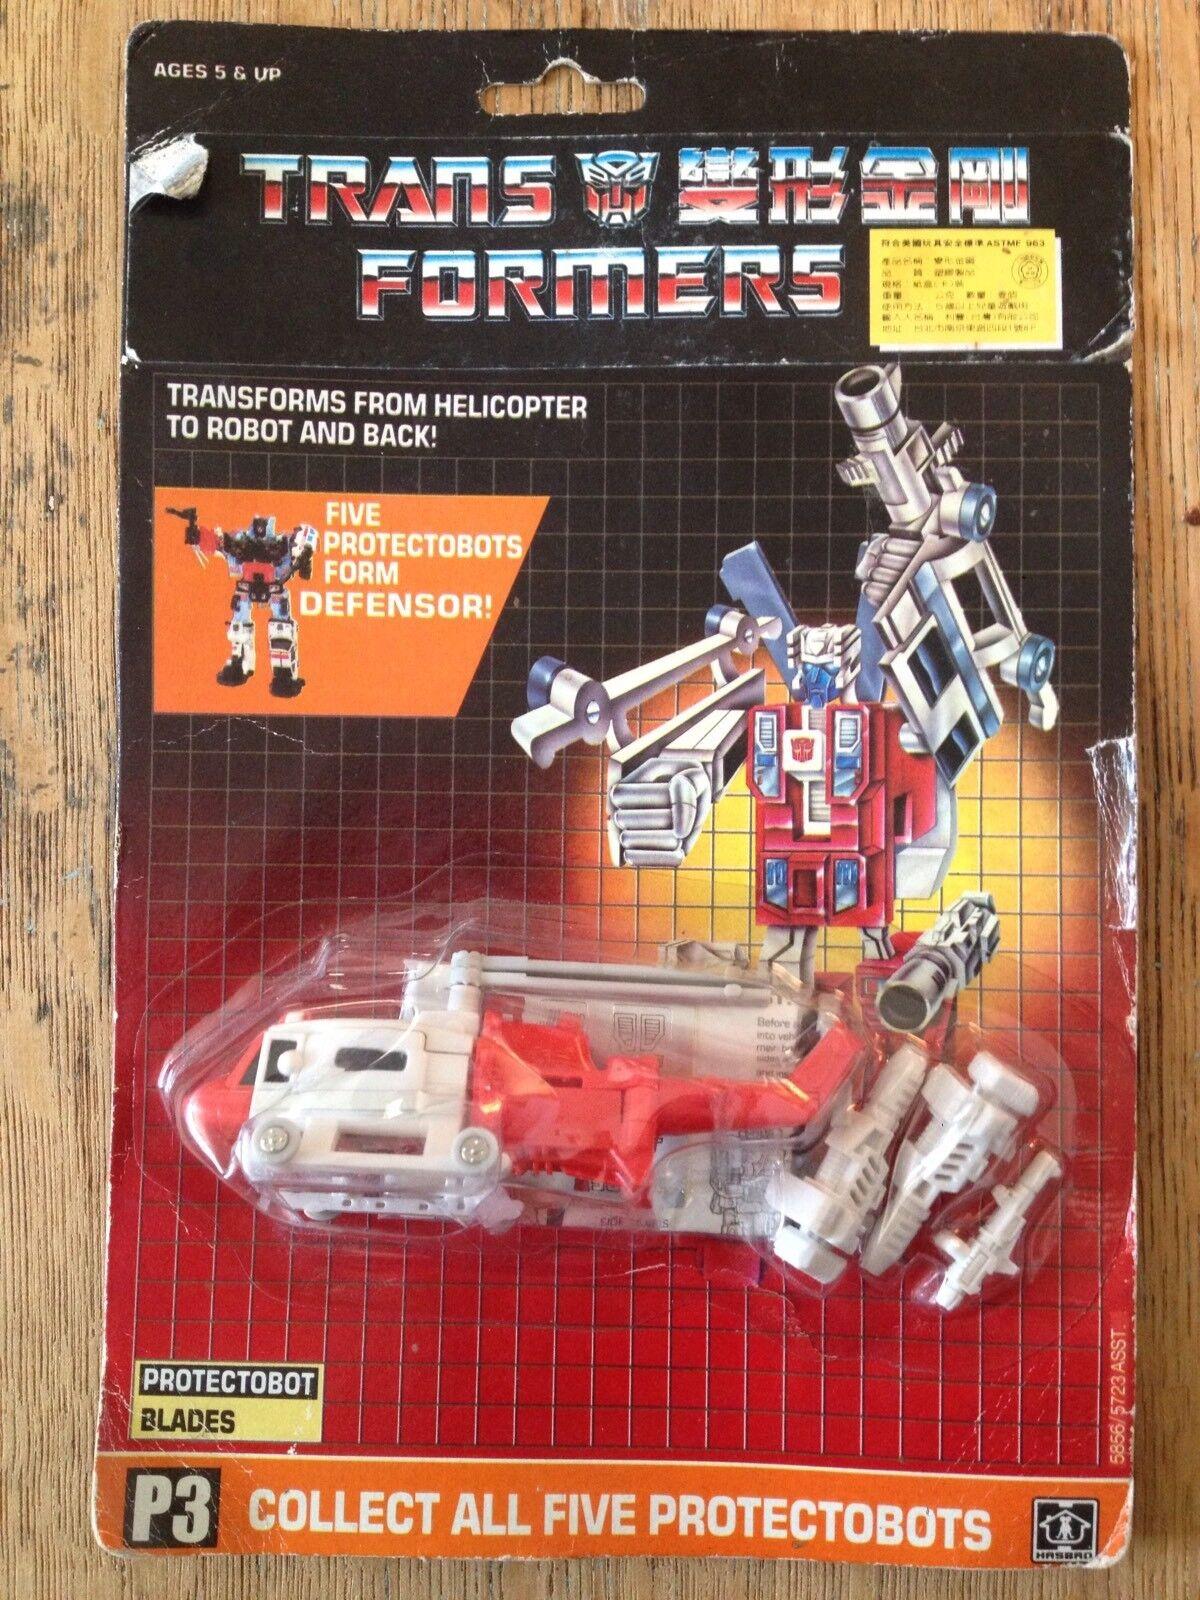 Rare Sealed 1986 Transformers Original G1 Predectobot Blades